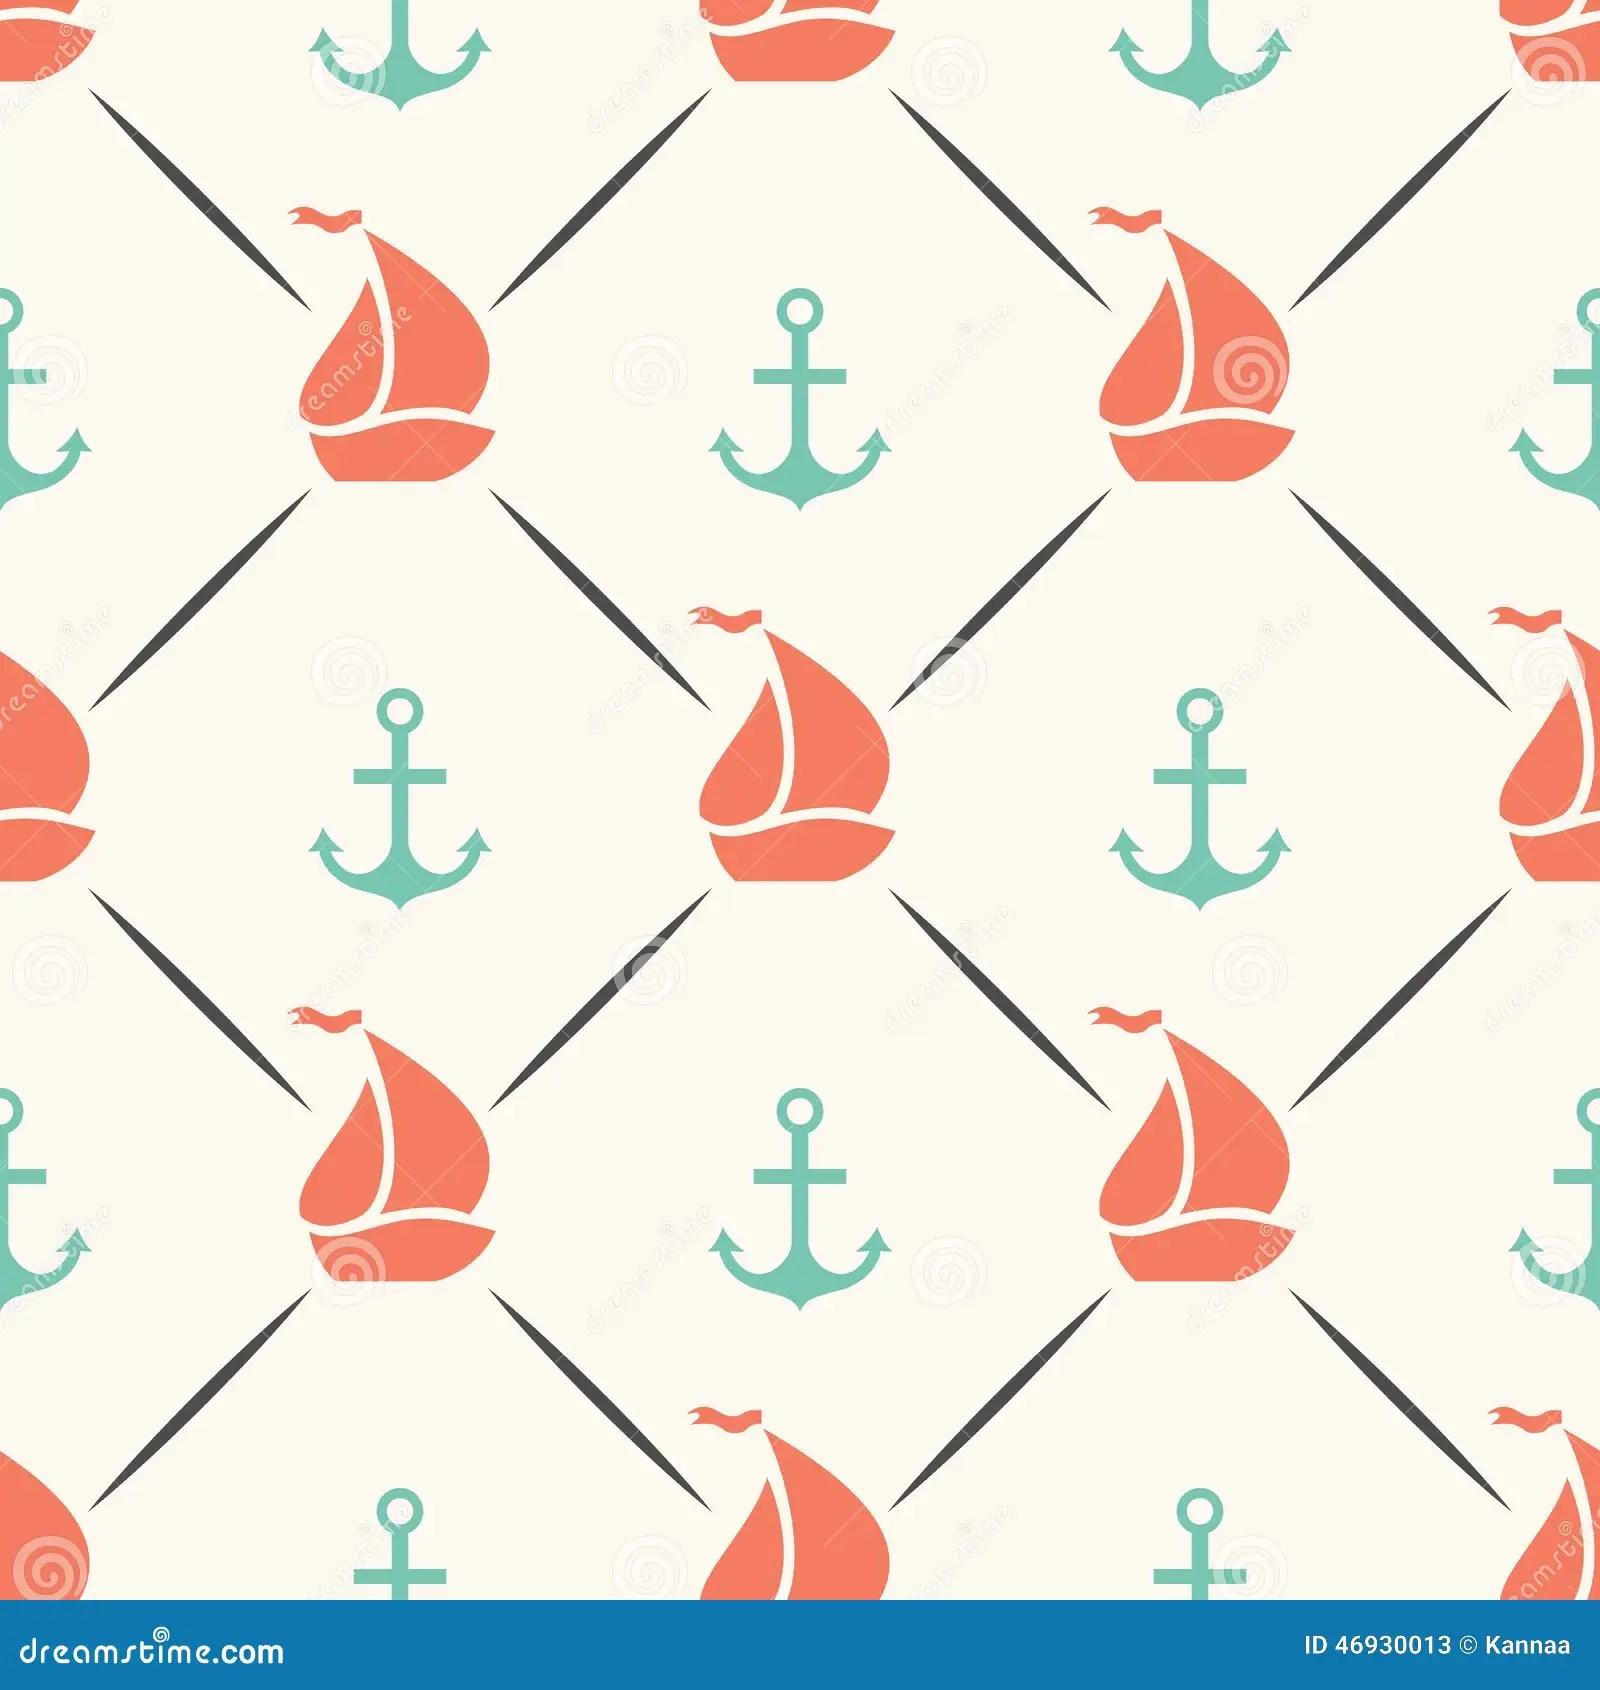 Black And White Polka Dot Wallpaper Border Seamless Vector Pattern Of Anchor Sailboat Shape Stock